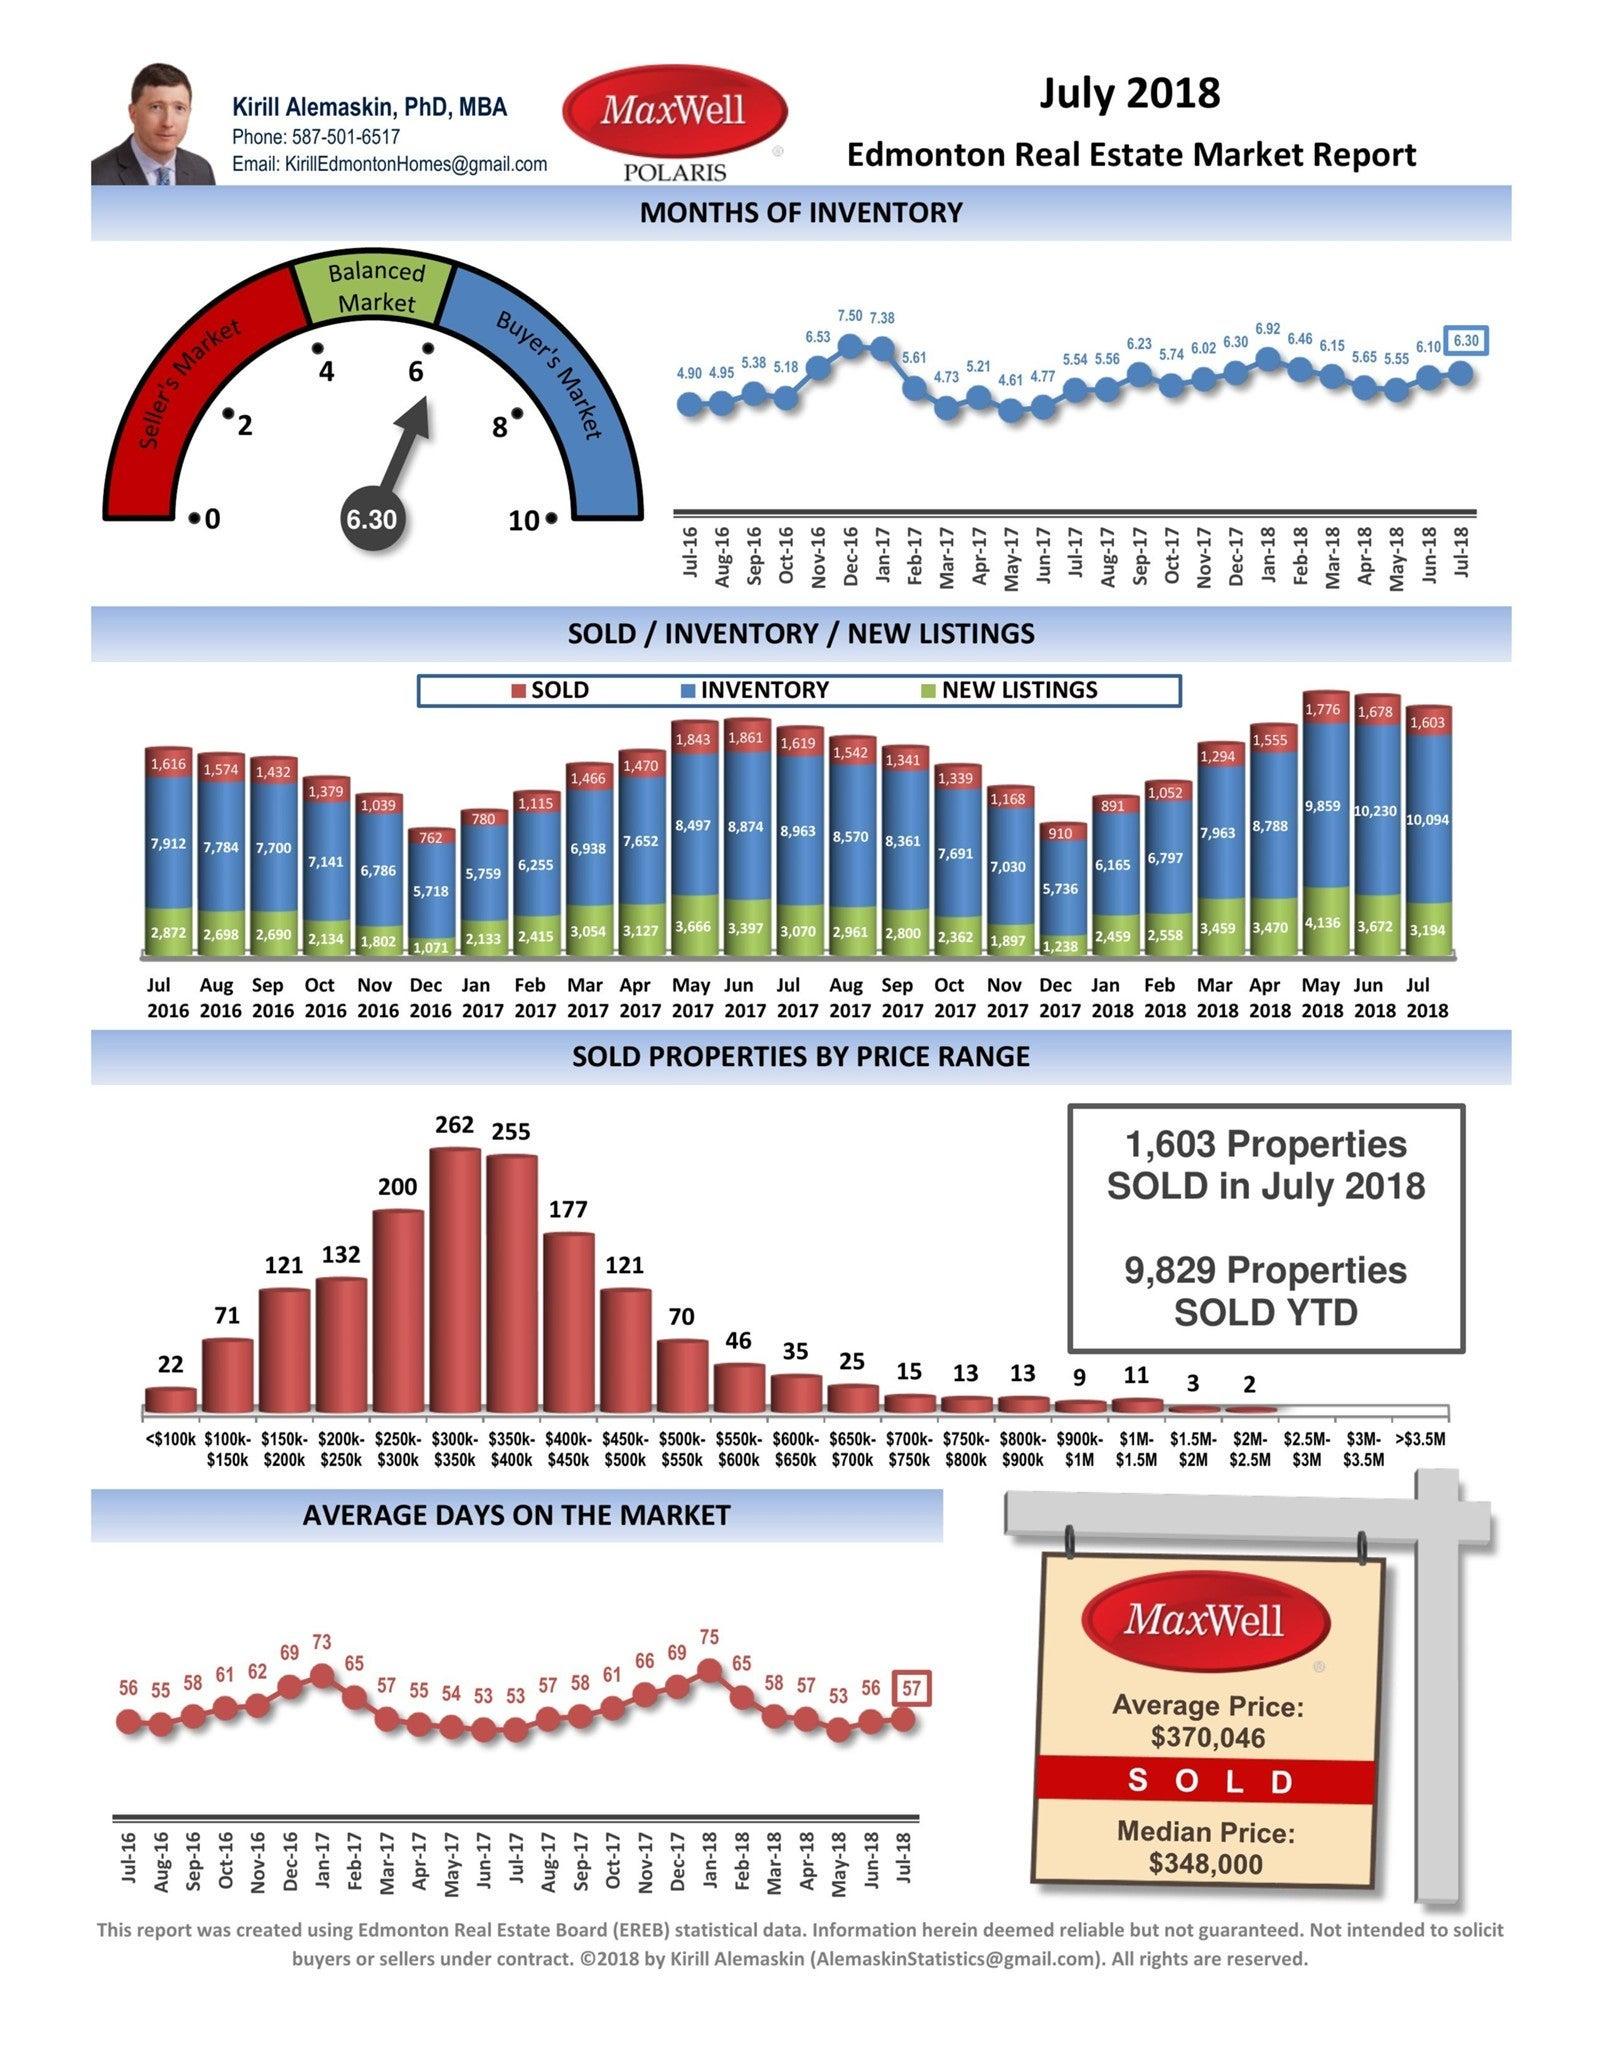 July 2018 Edmonton Real Estate Market Report